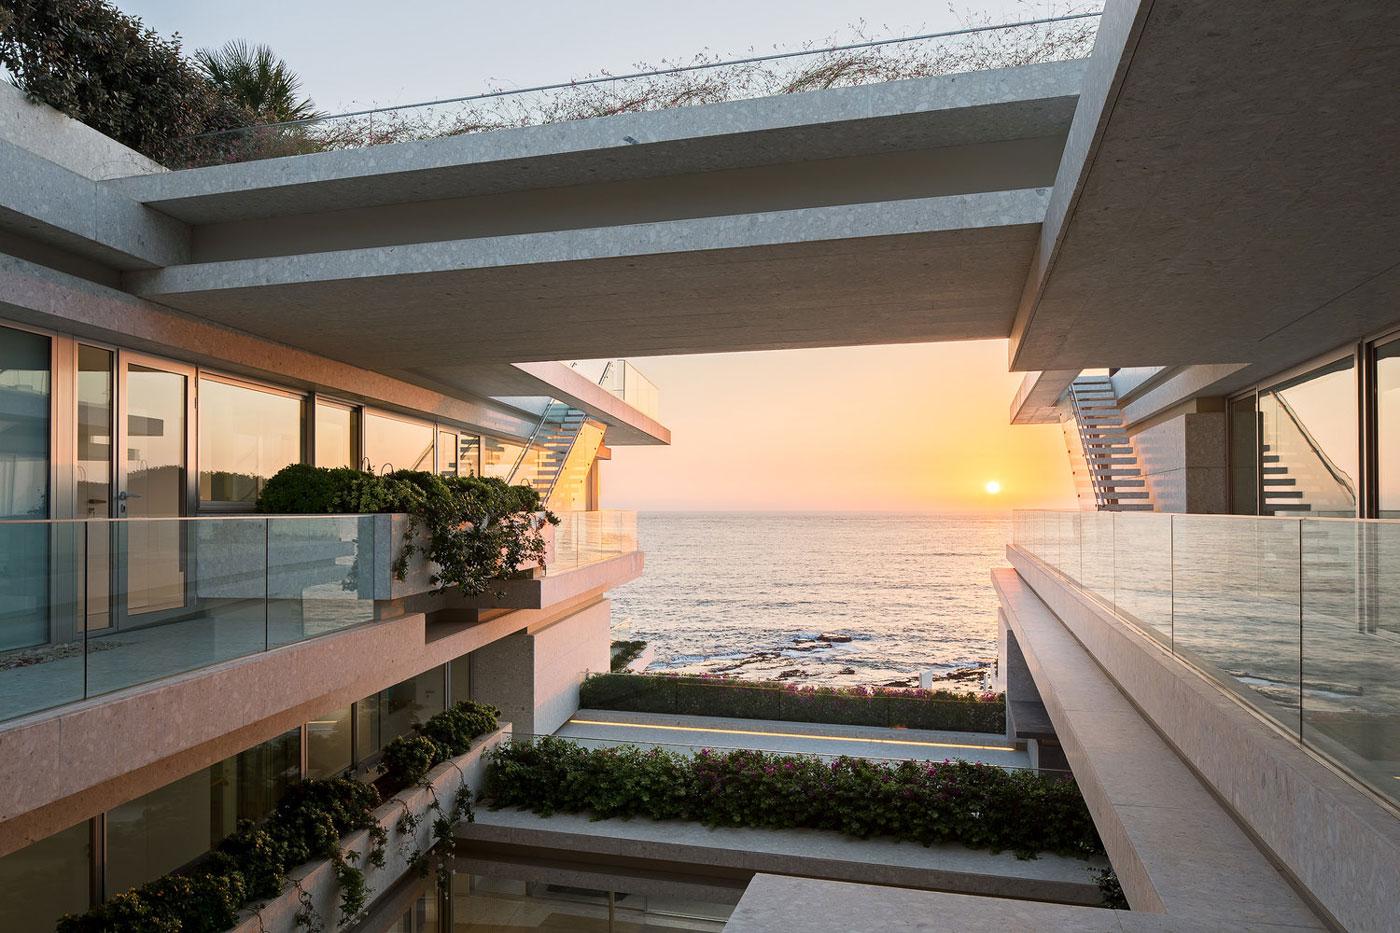 Sunset views, balcony